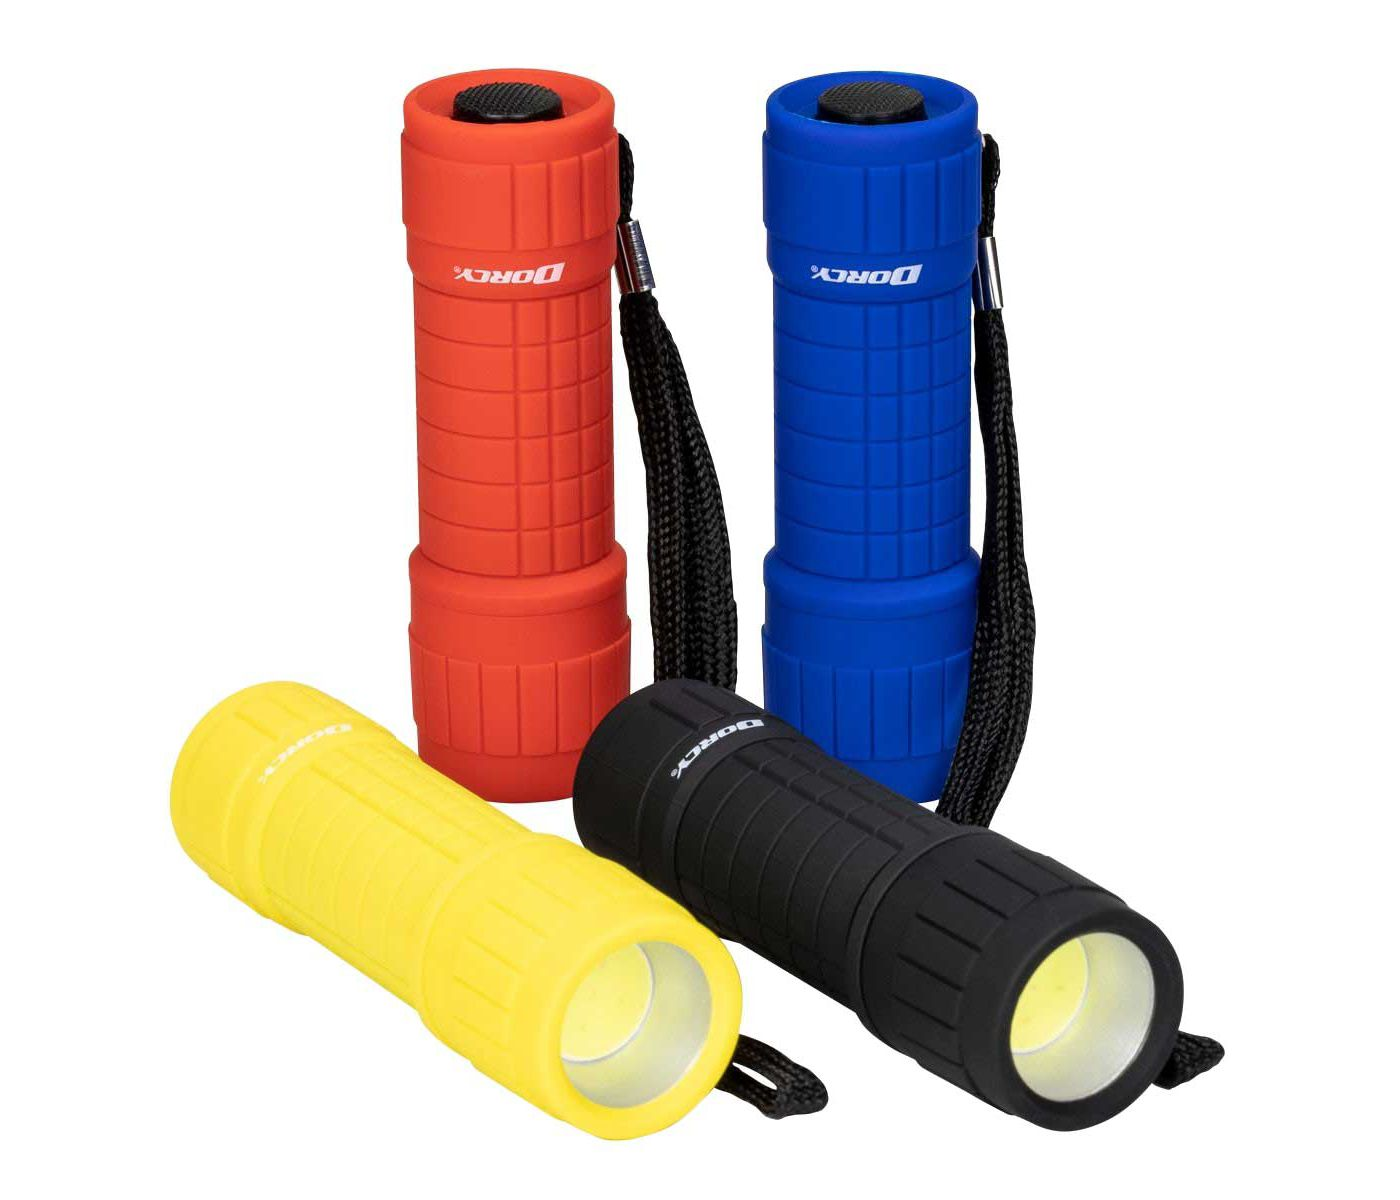 Dorcy LED Flashlight 4-Pack